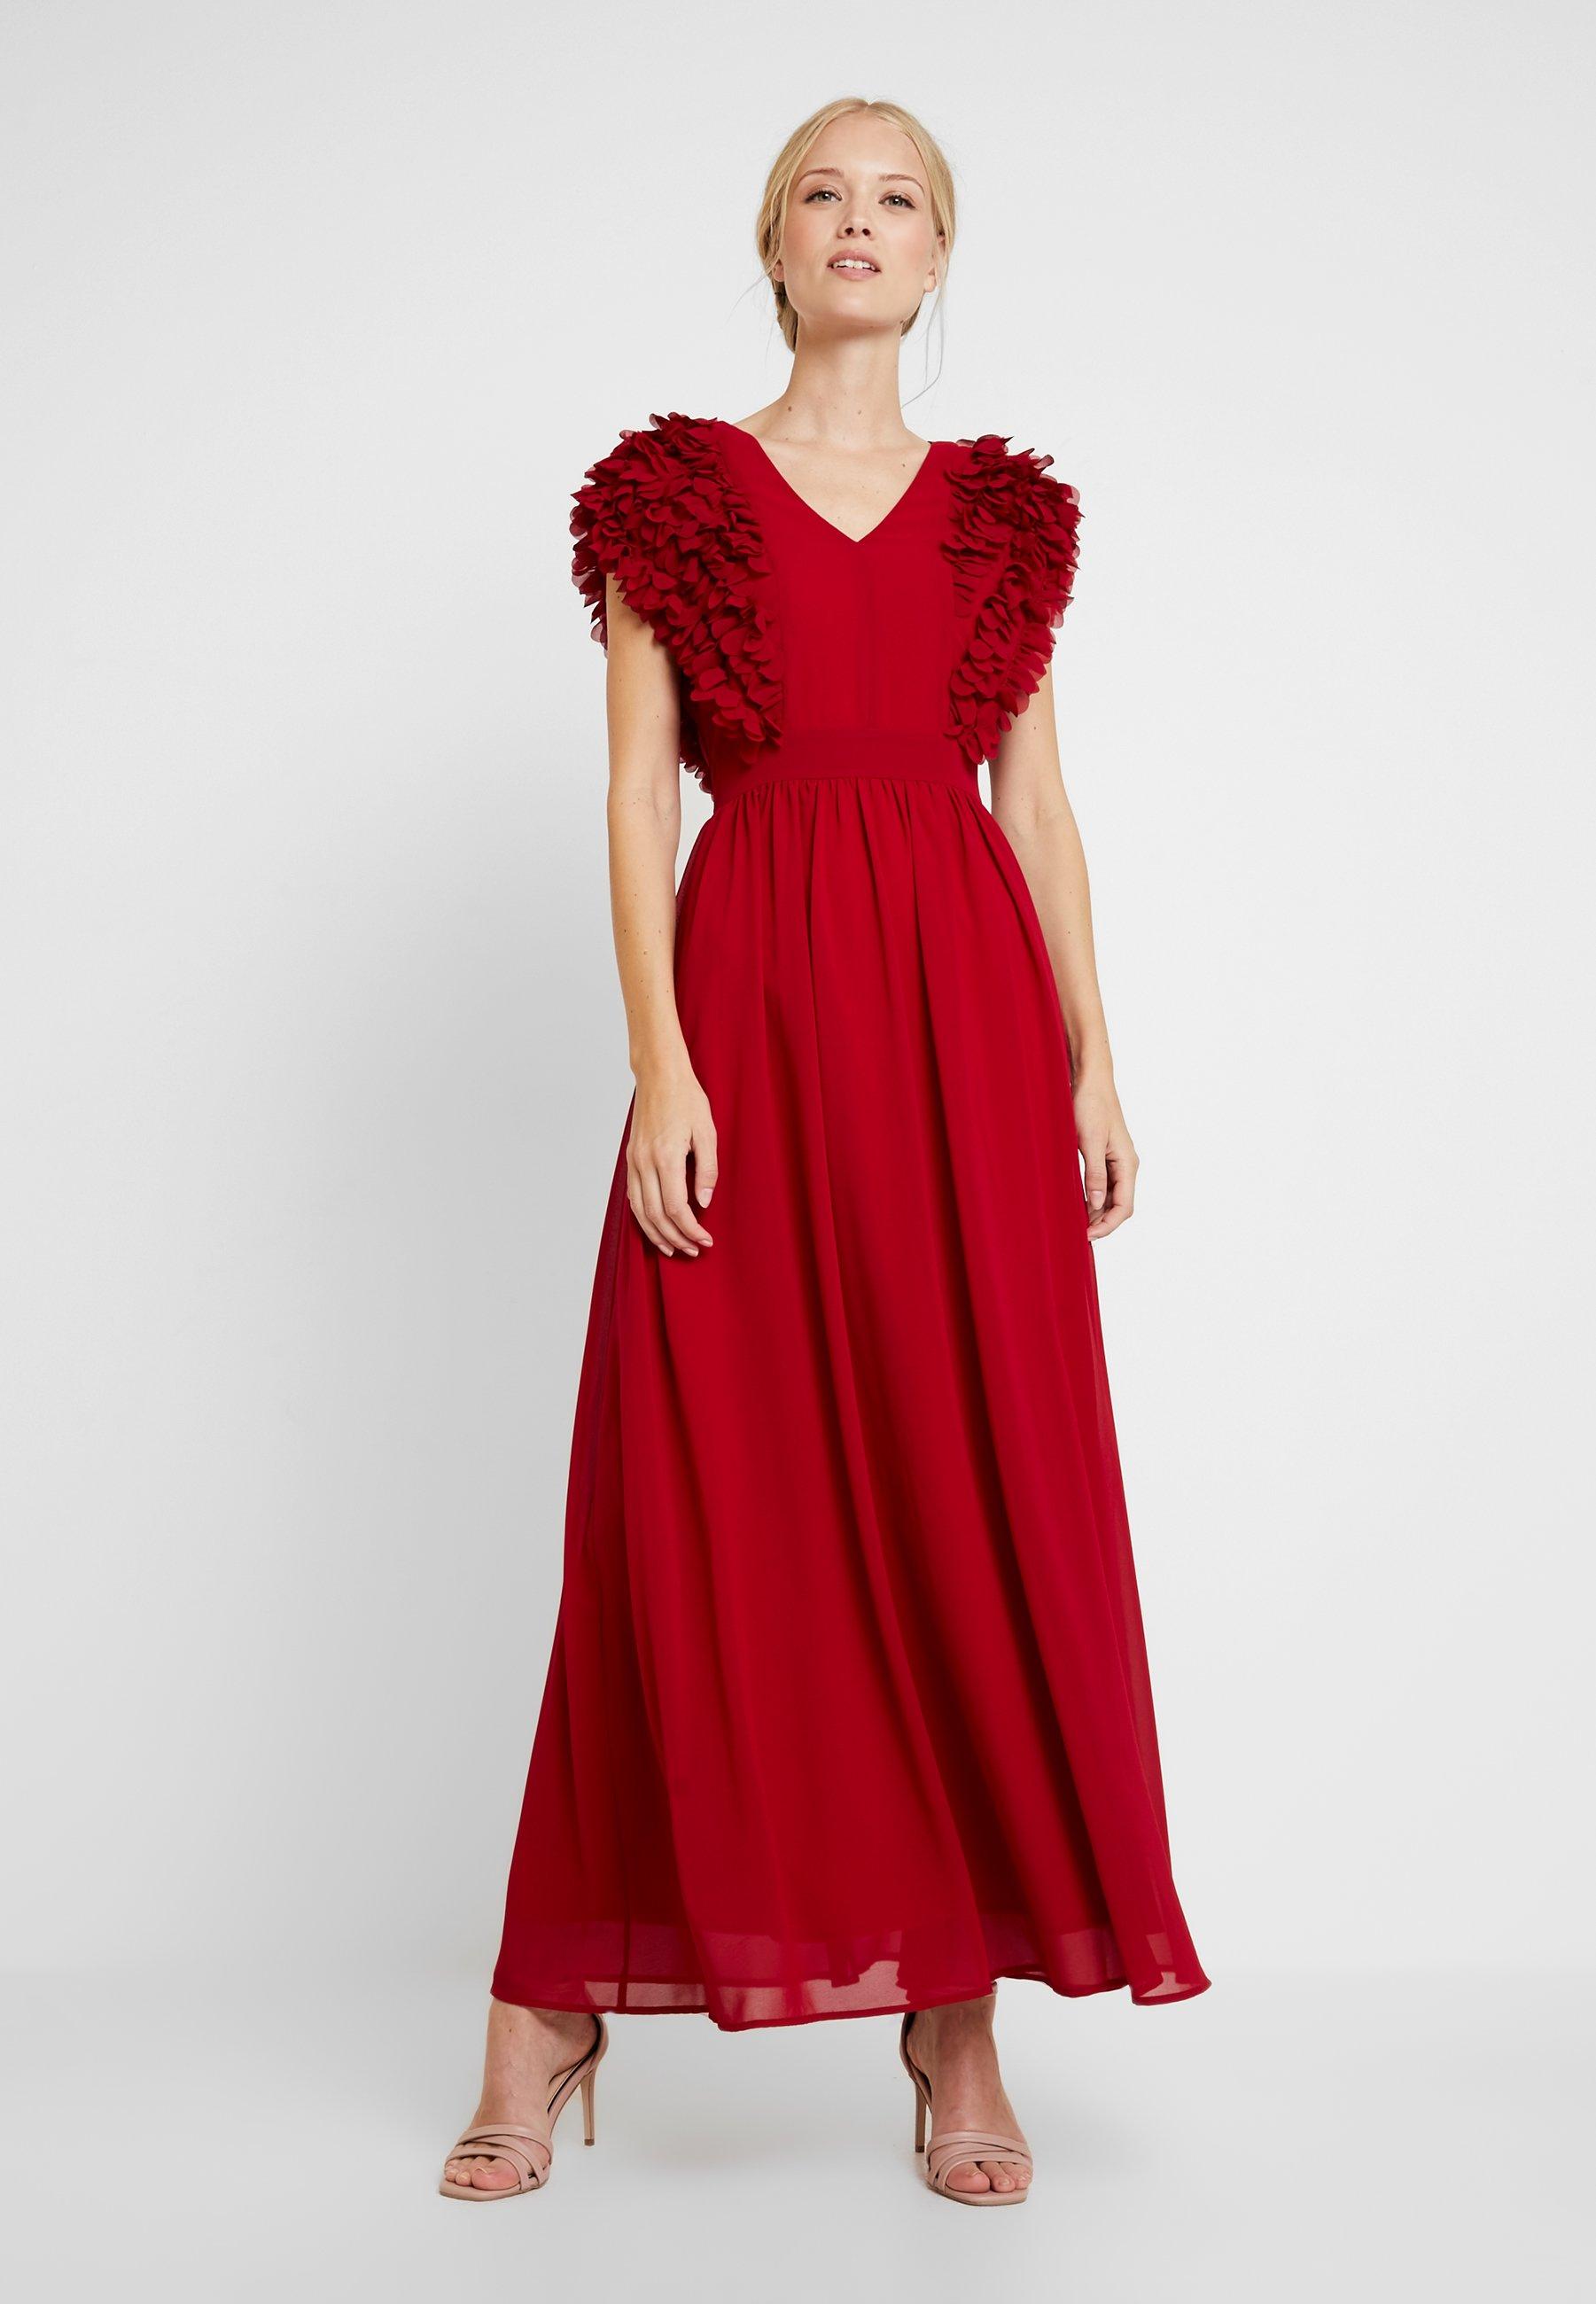 De Lipstick DressRobe Apart Cocktail Red N0mnwv8O